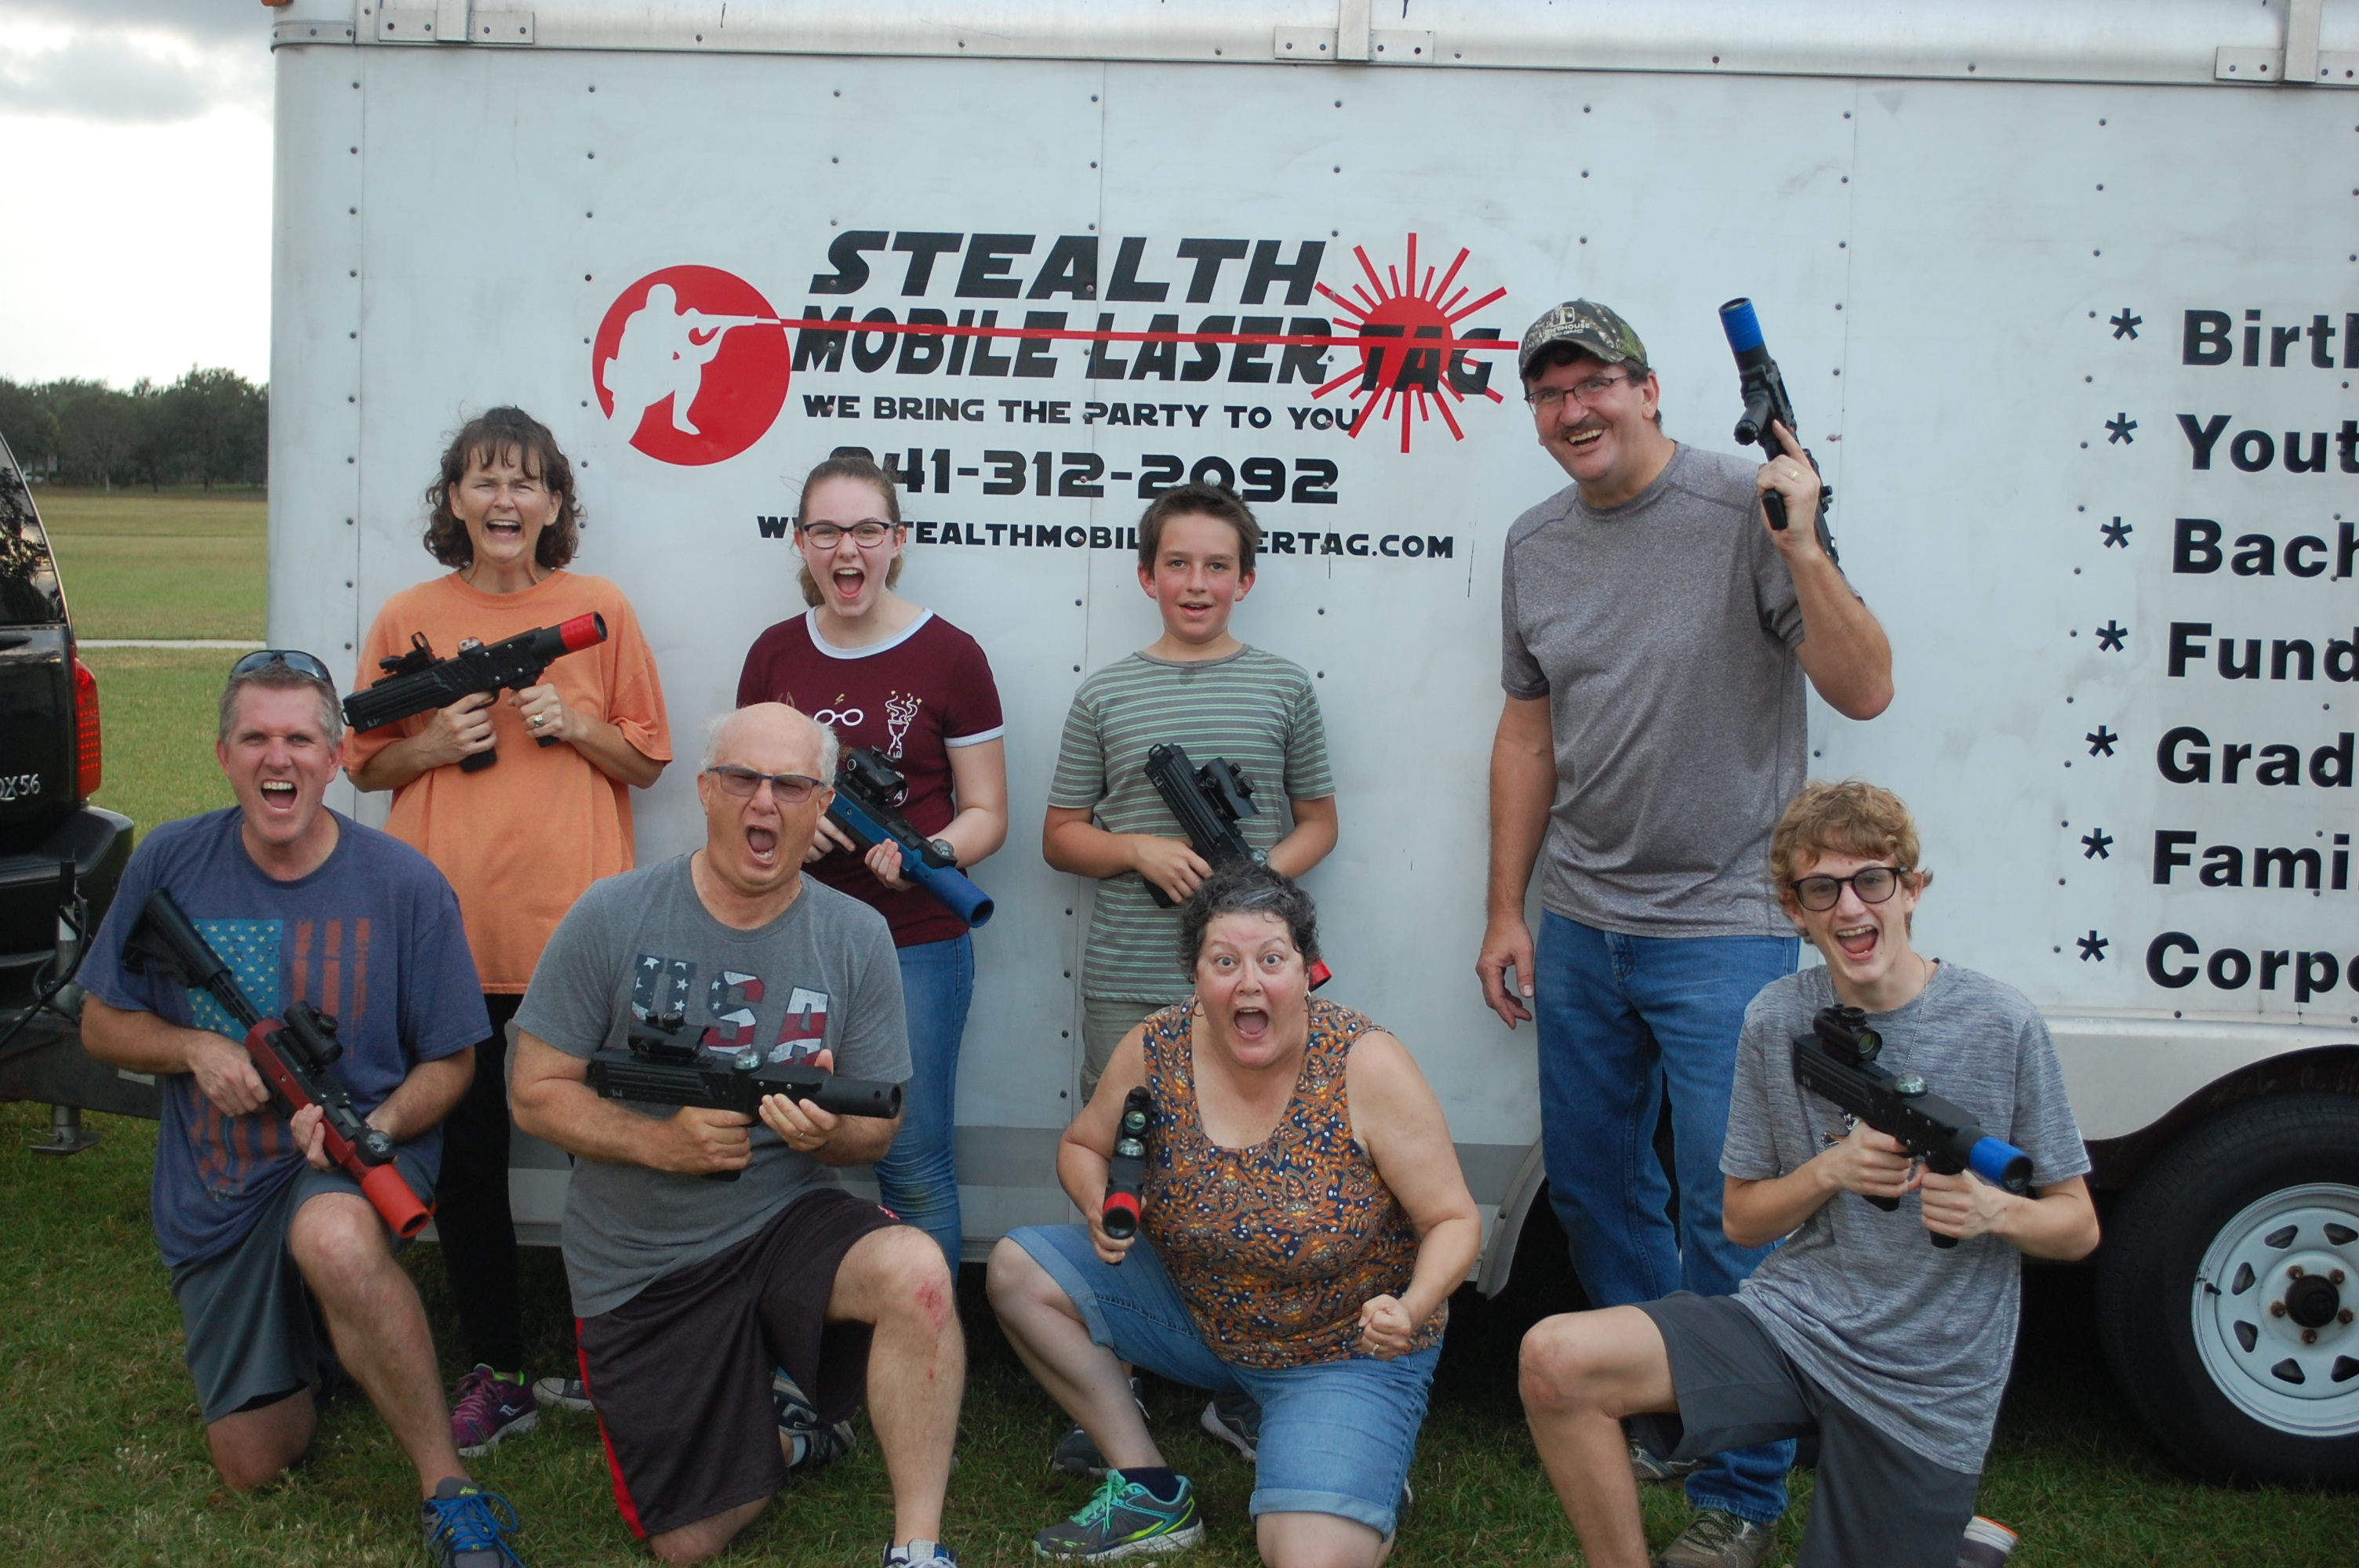 Family Reunion Ideas in FL